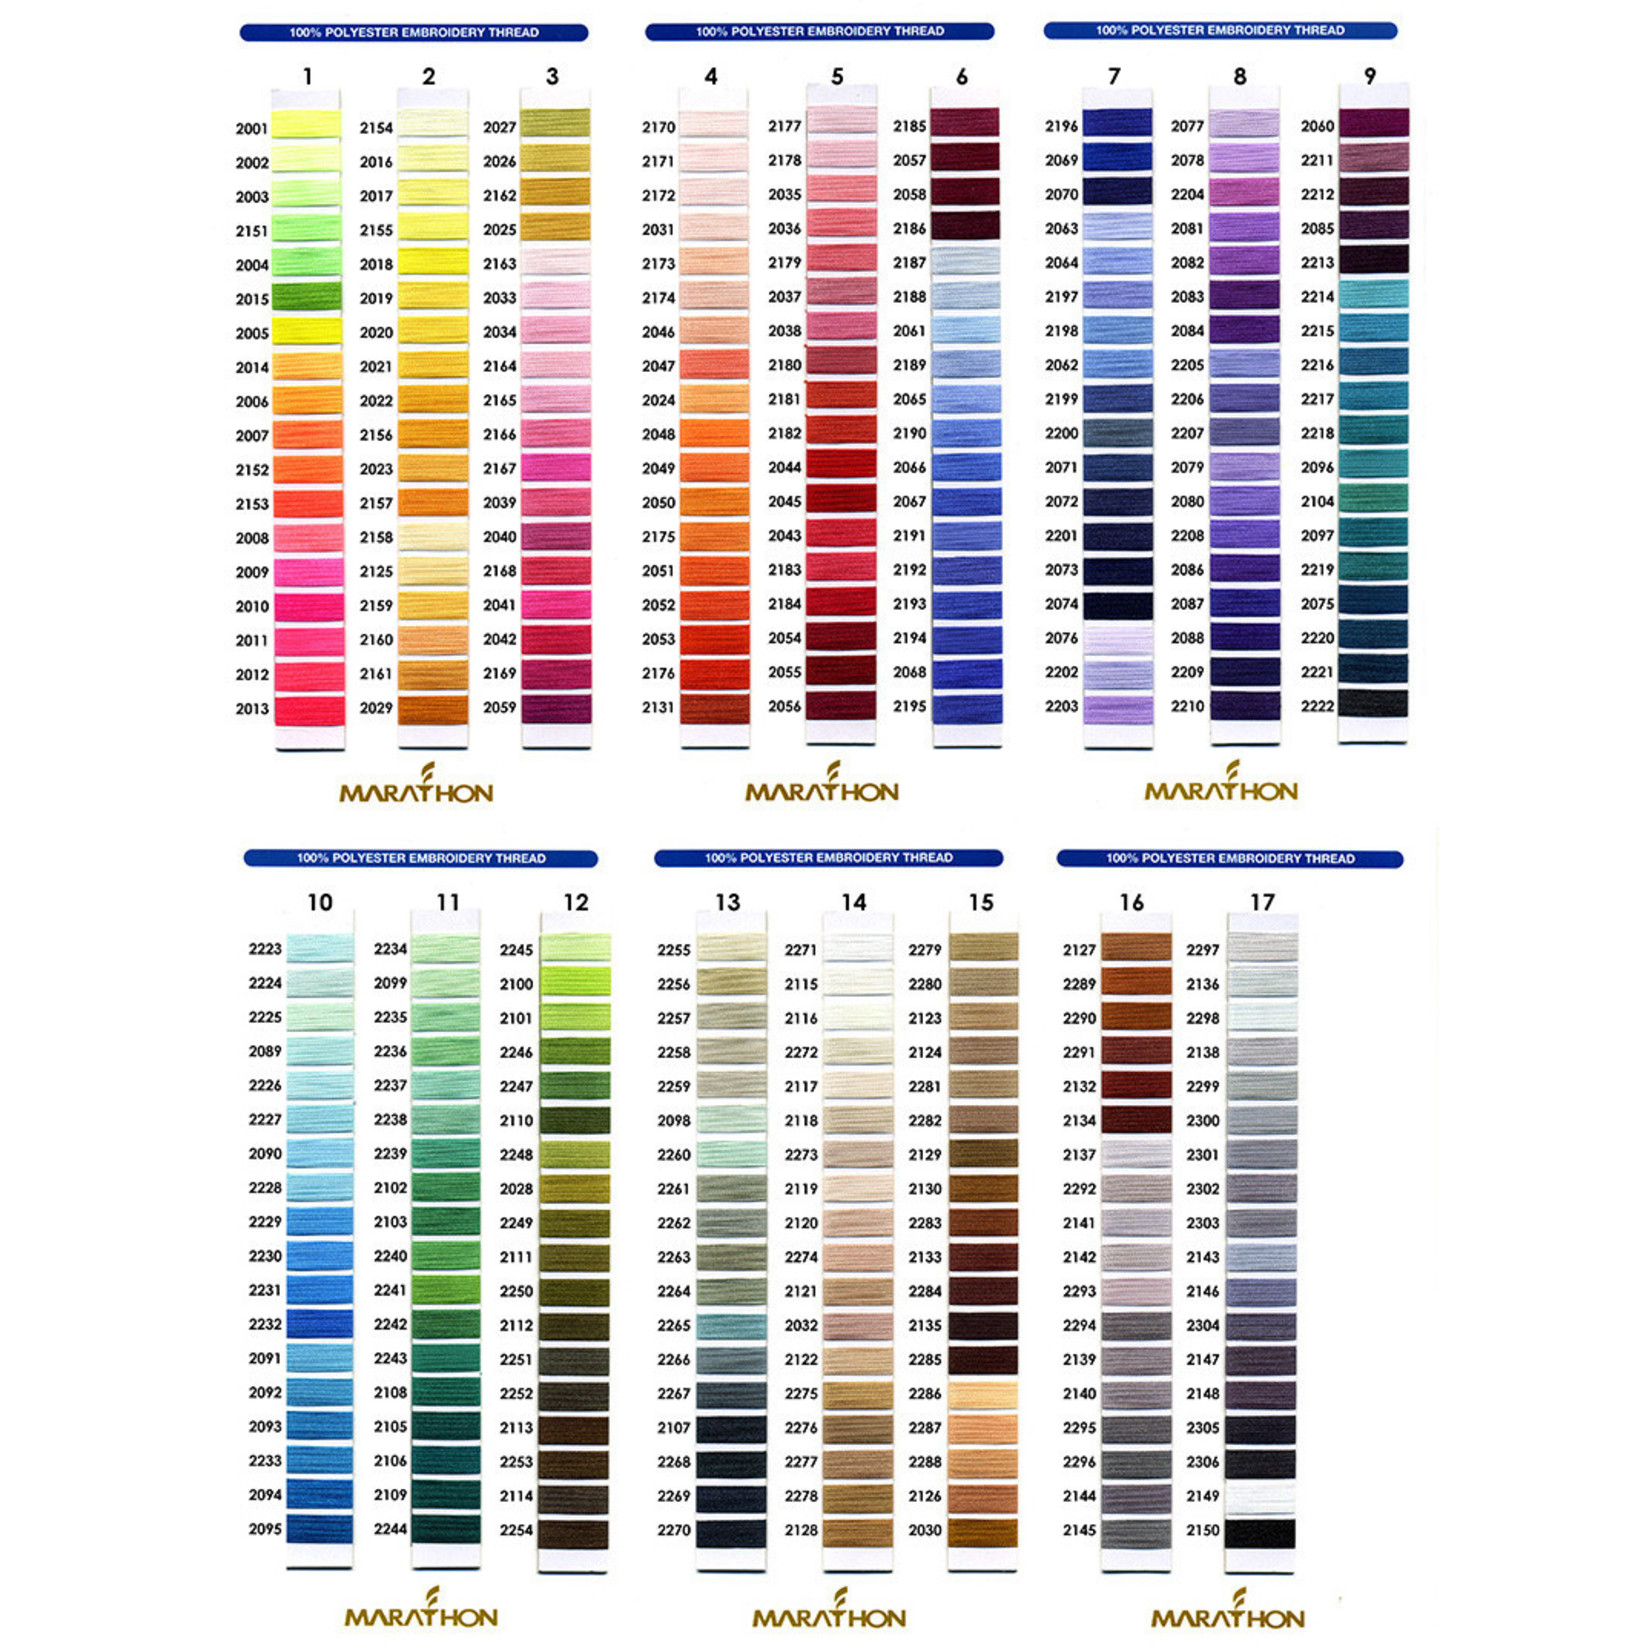 MARATHON Colour 2209 - 5000mtr POLY EMBROIDERY THREAD